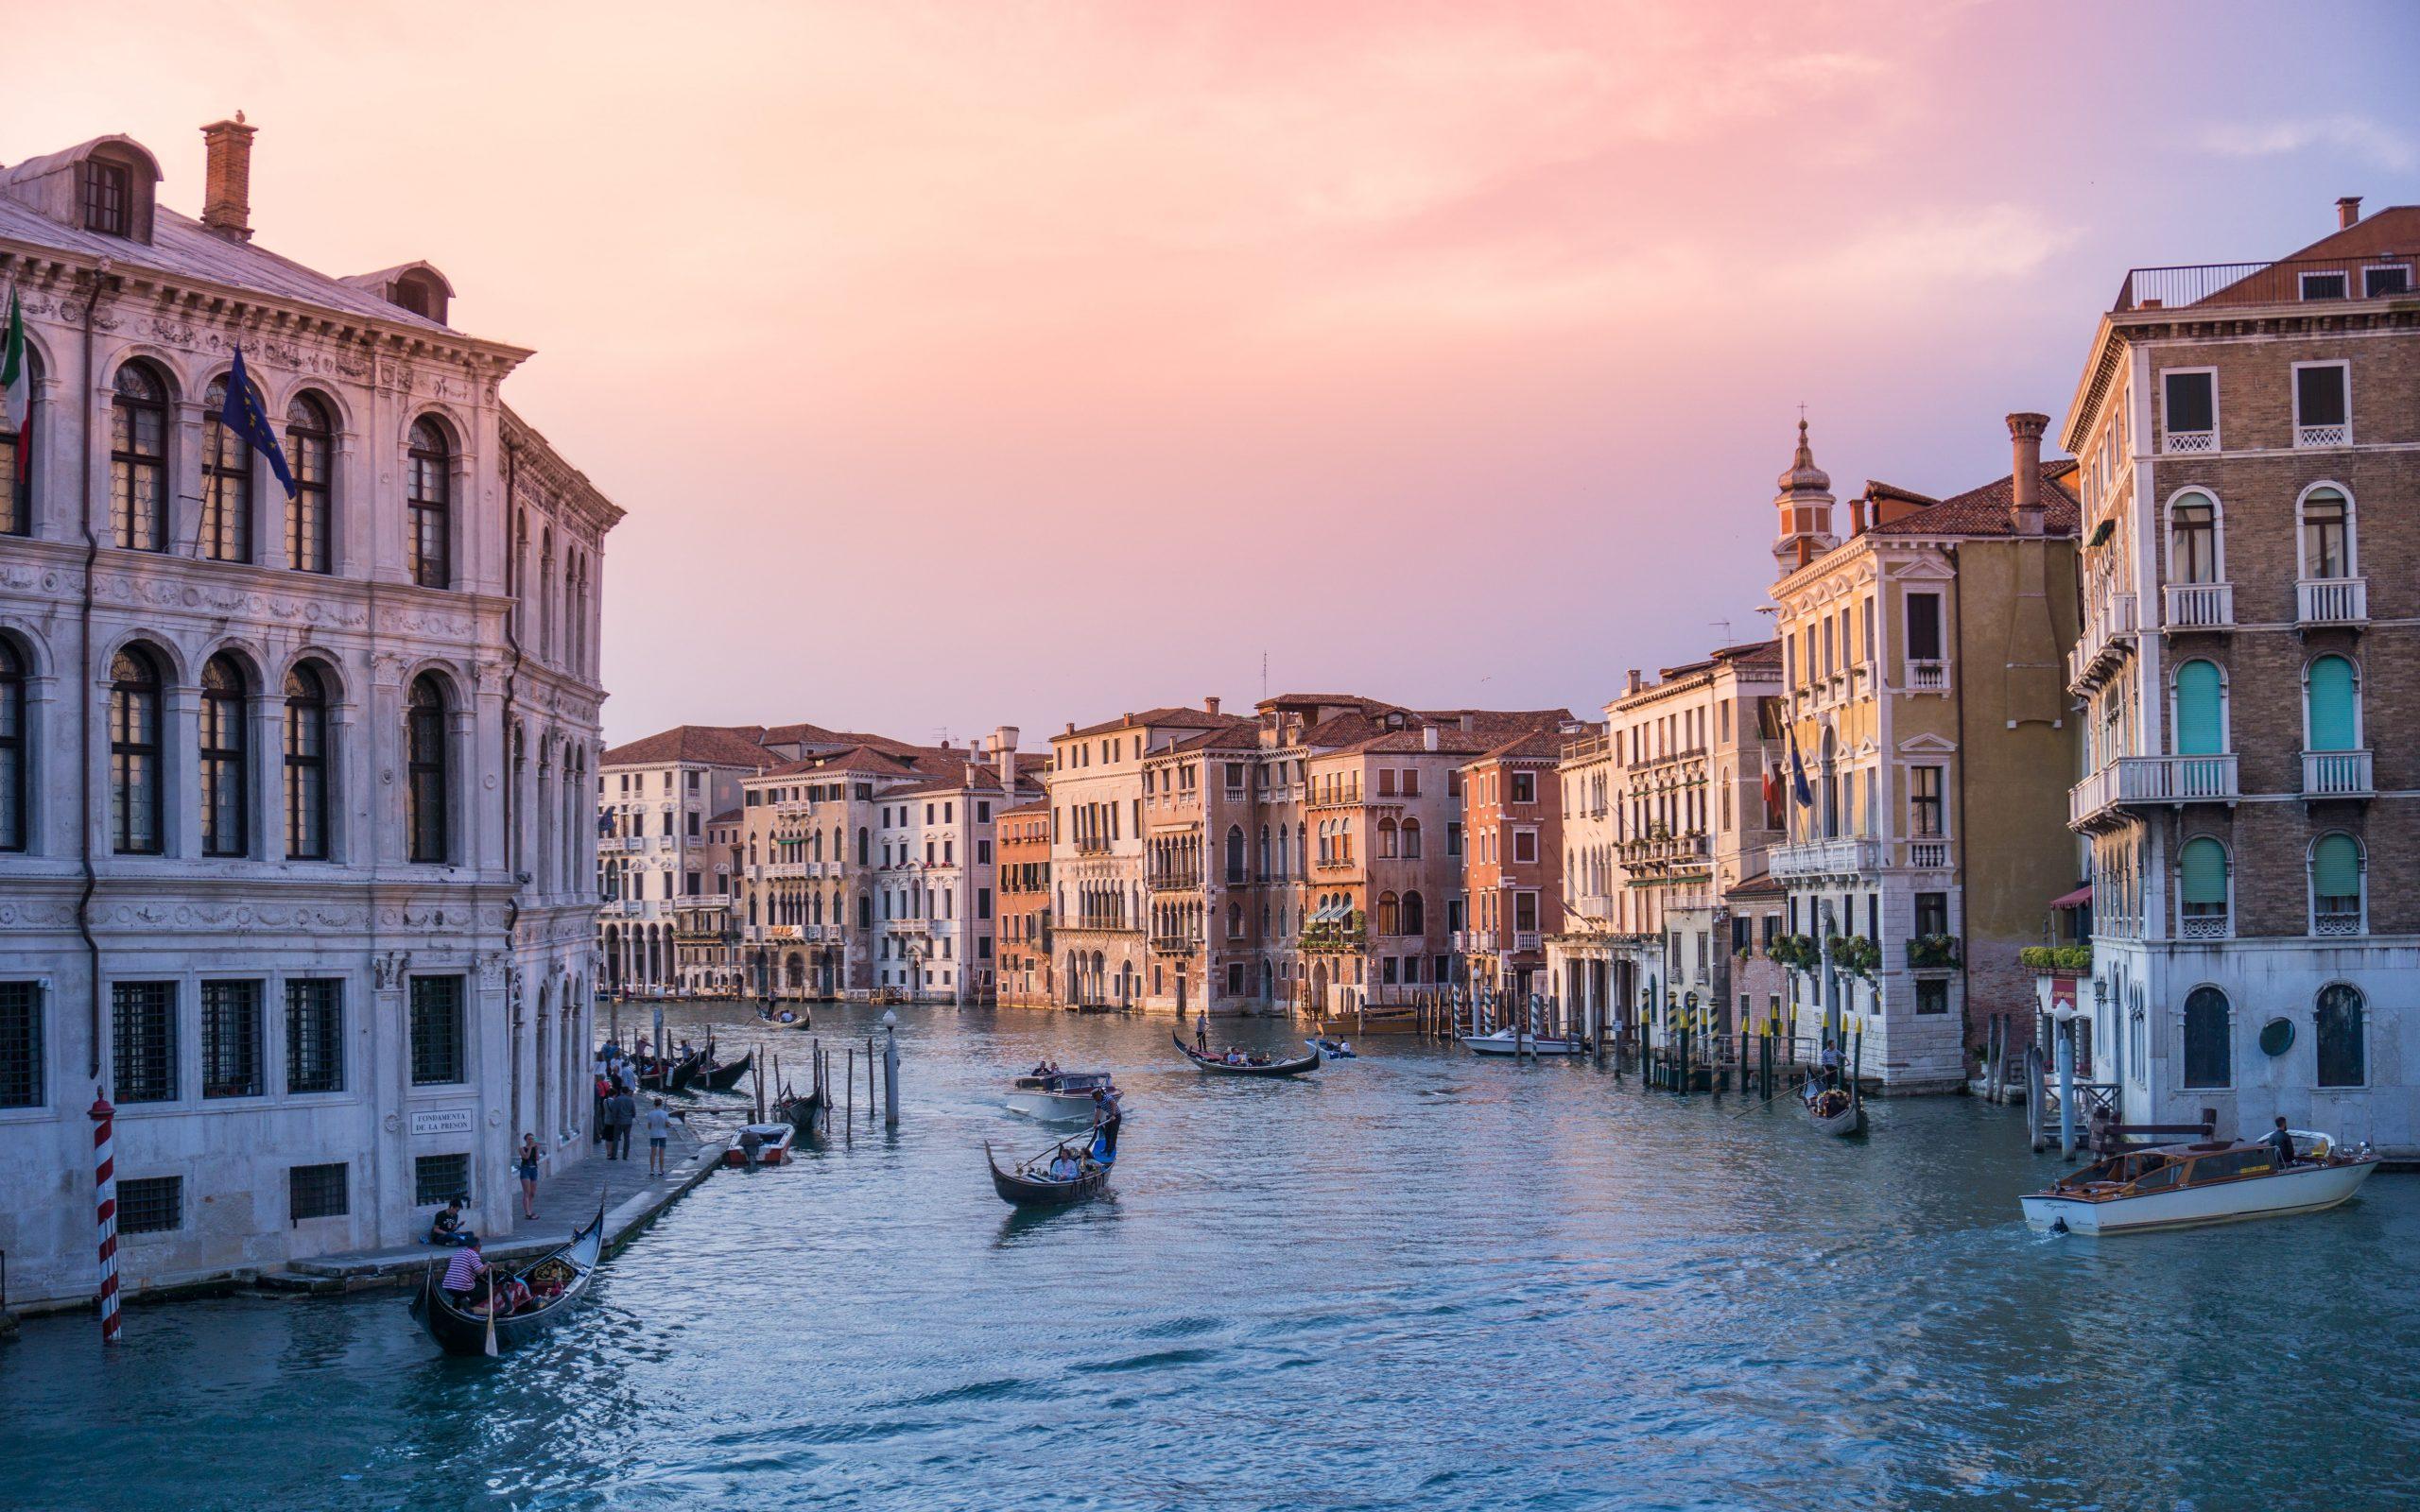 studentska viza za italiju - via academica naslovna